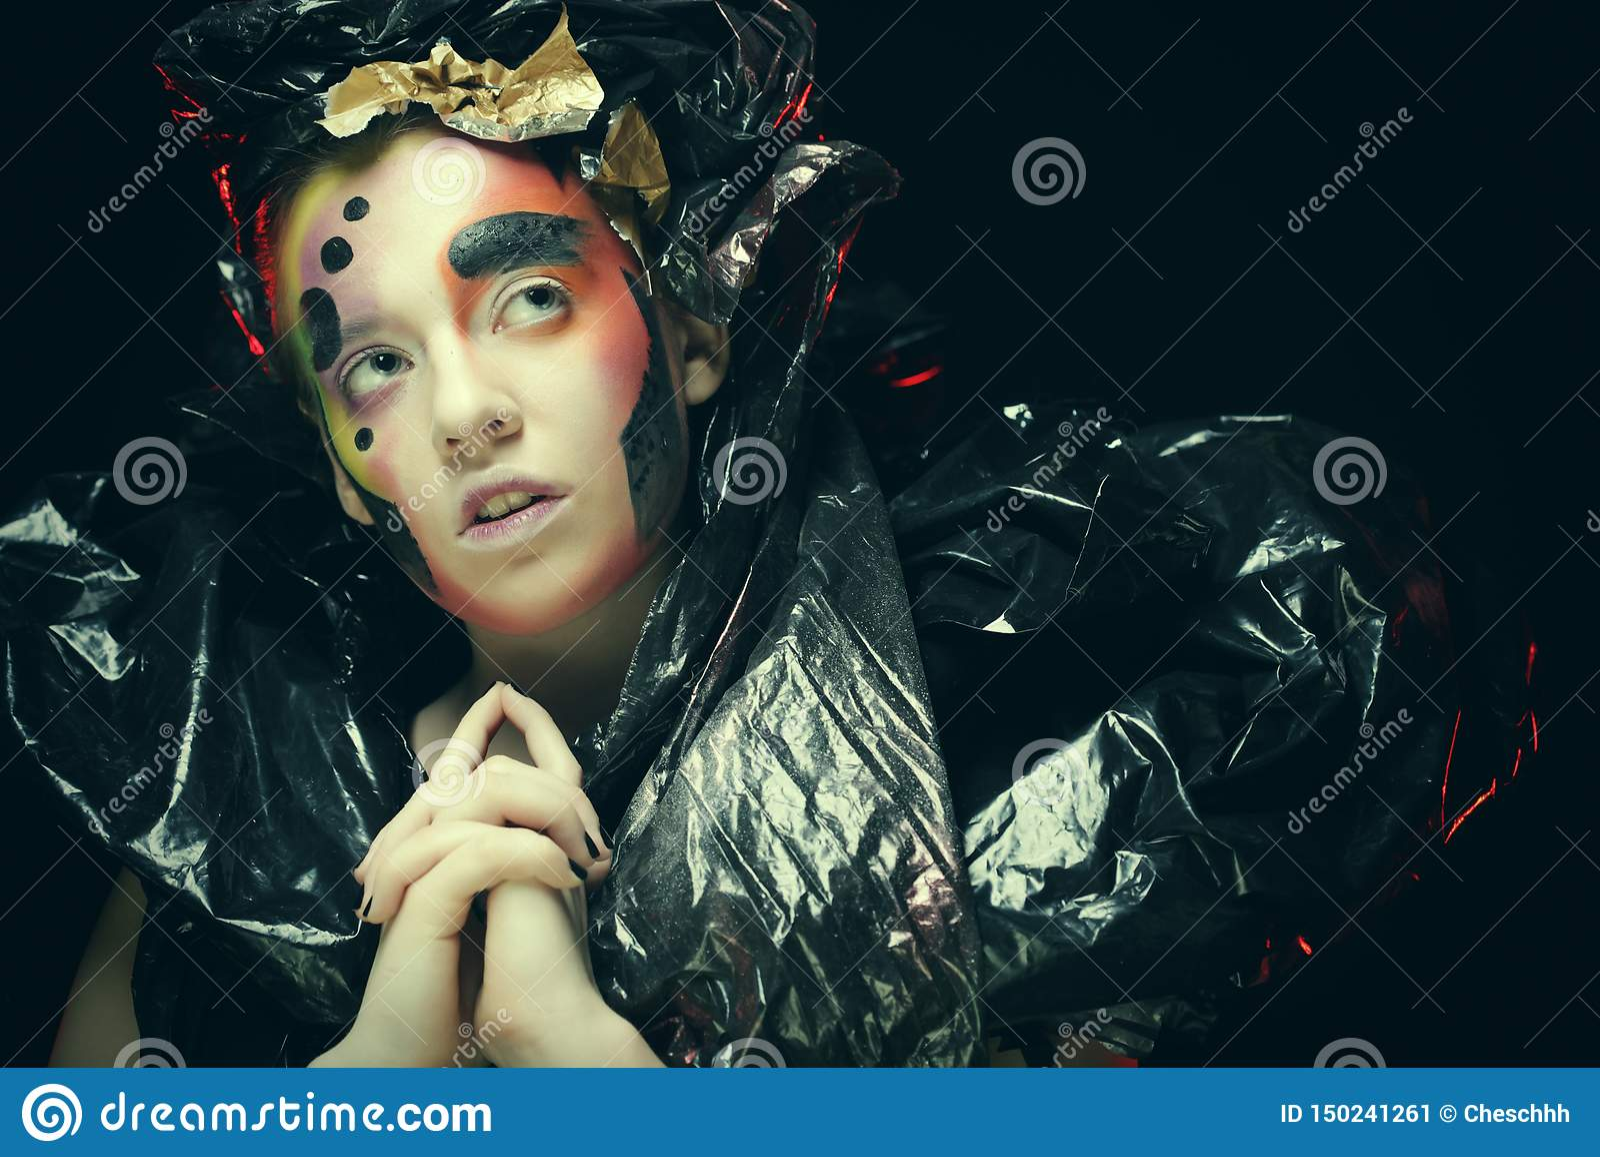 Dark Beautiful Gothic Princess.Halloween party